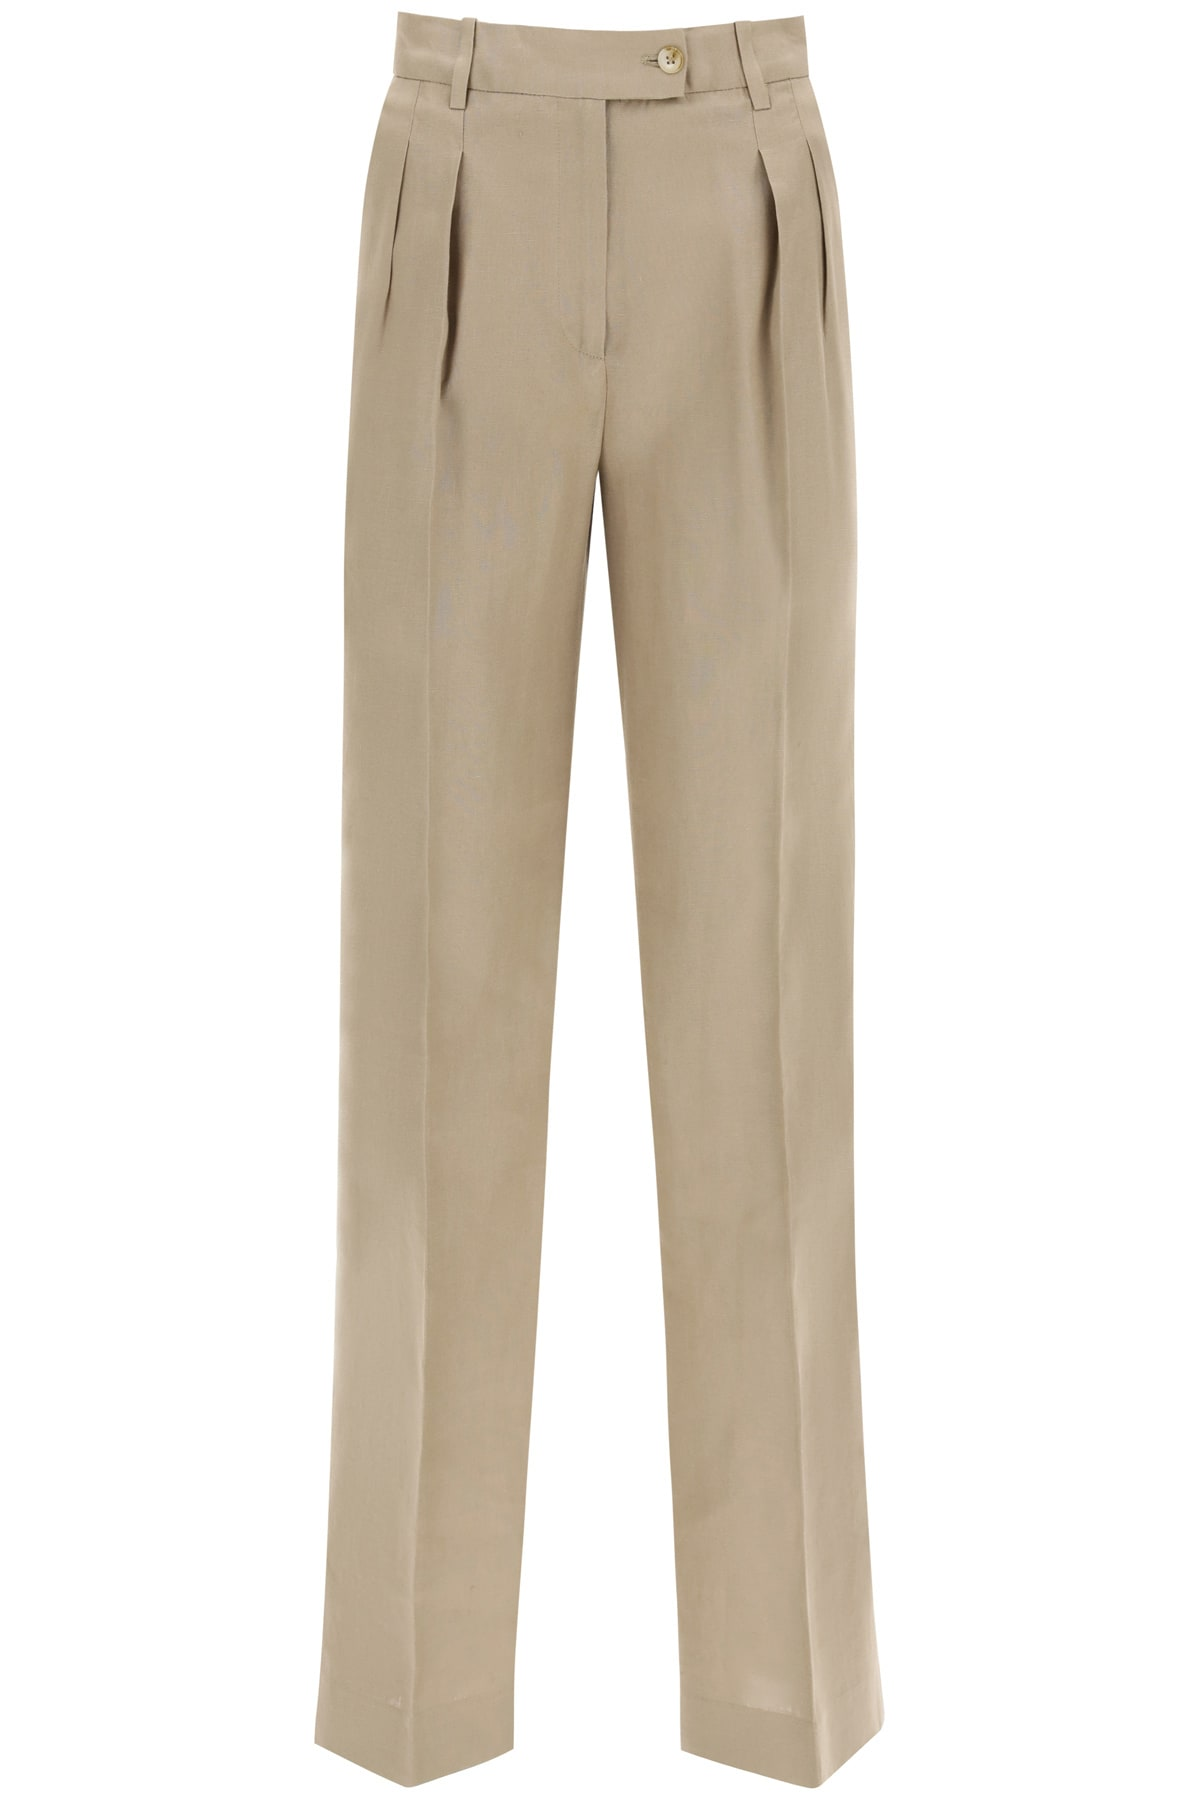 Loulou Studio Clothing BIDONG LINEN PANTS